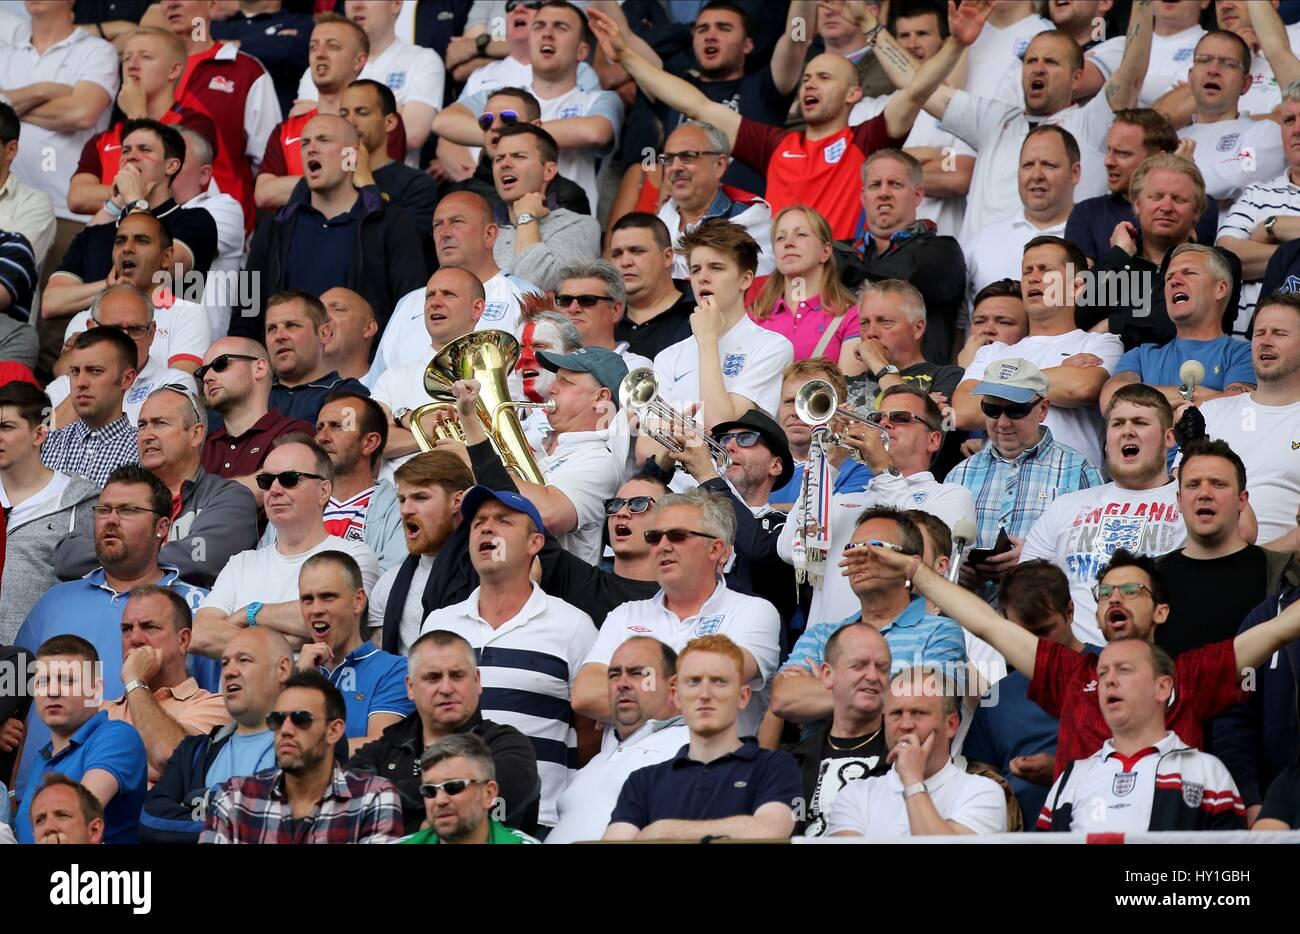 ENGLAND BAND PLAYING A TUNE ENGLAND V WALES STADE FELIX BOLLAERT-DELELIS LENS FRANCE 16 June 2016 - Stock Image